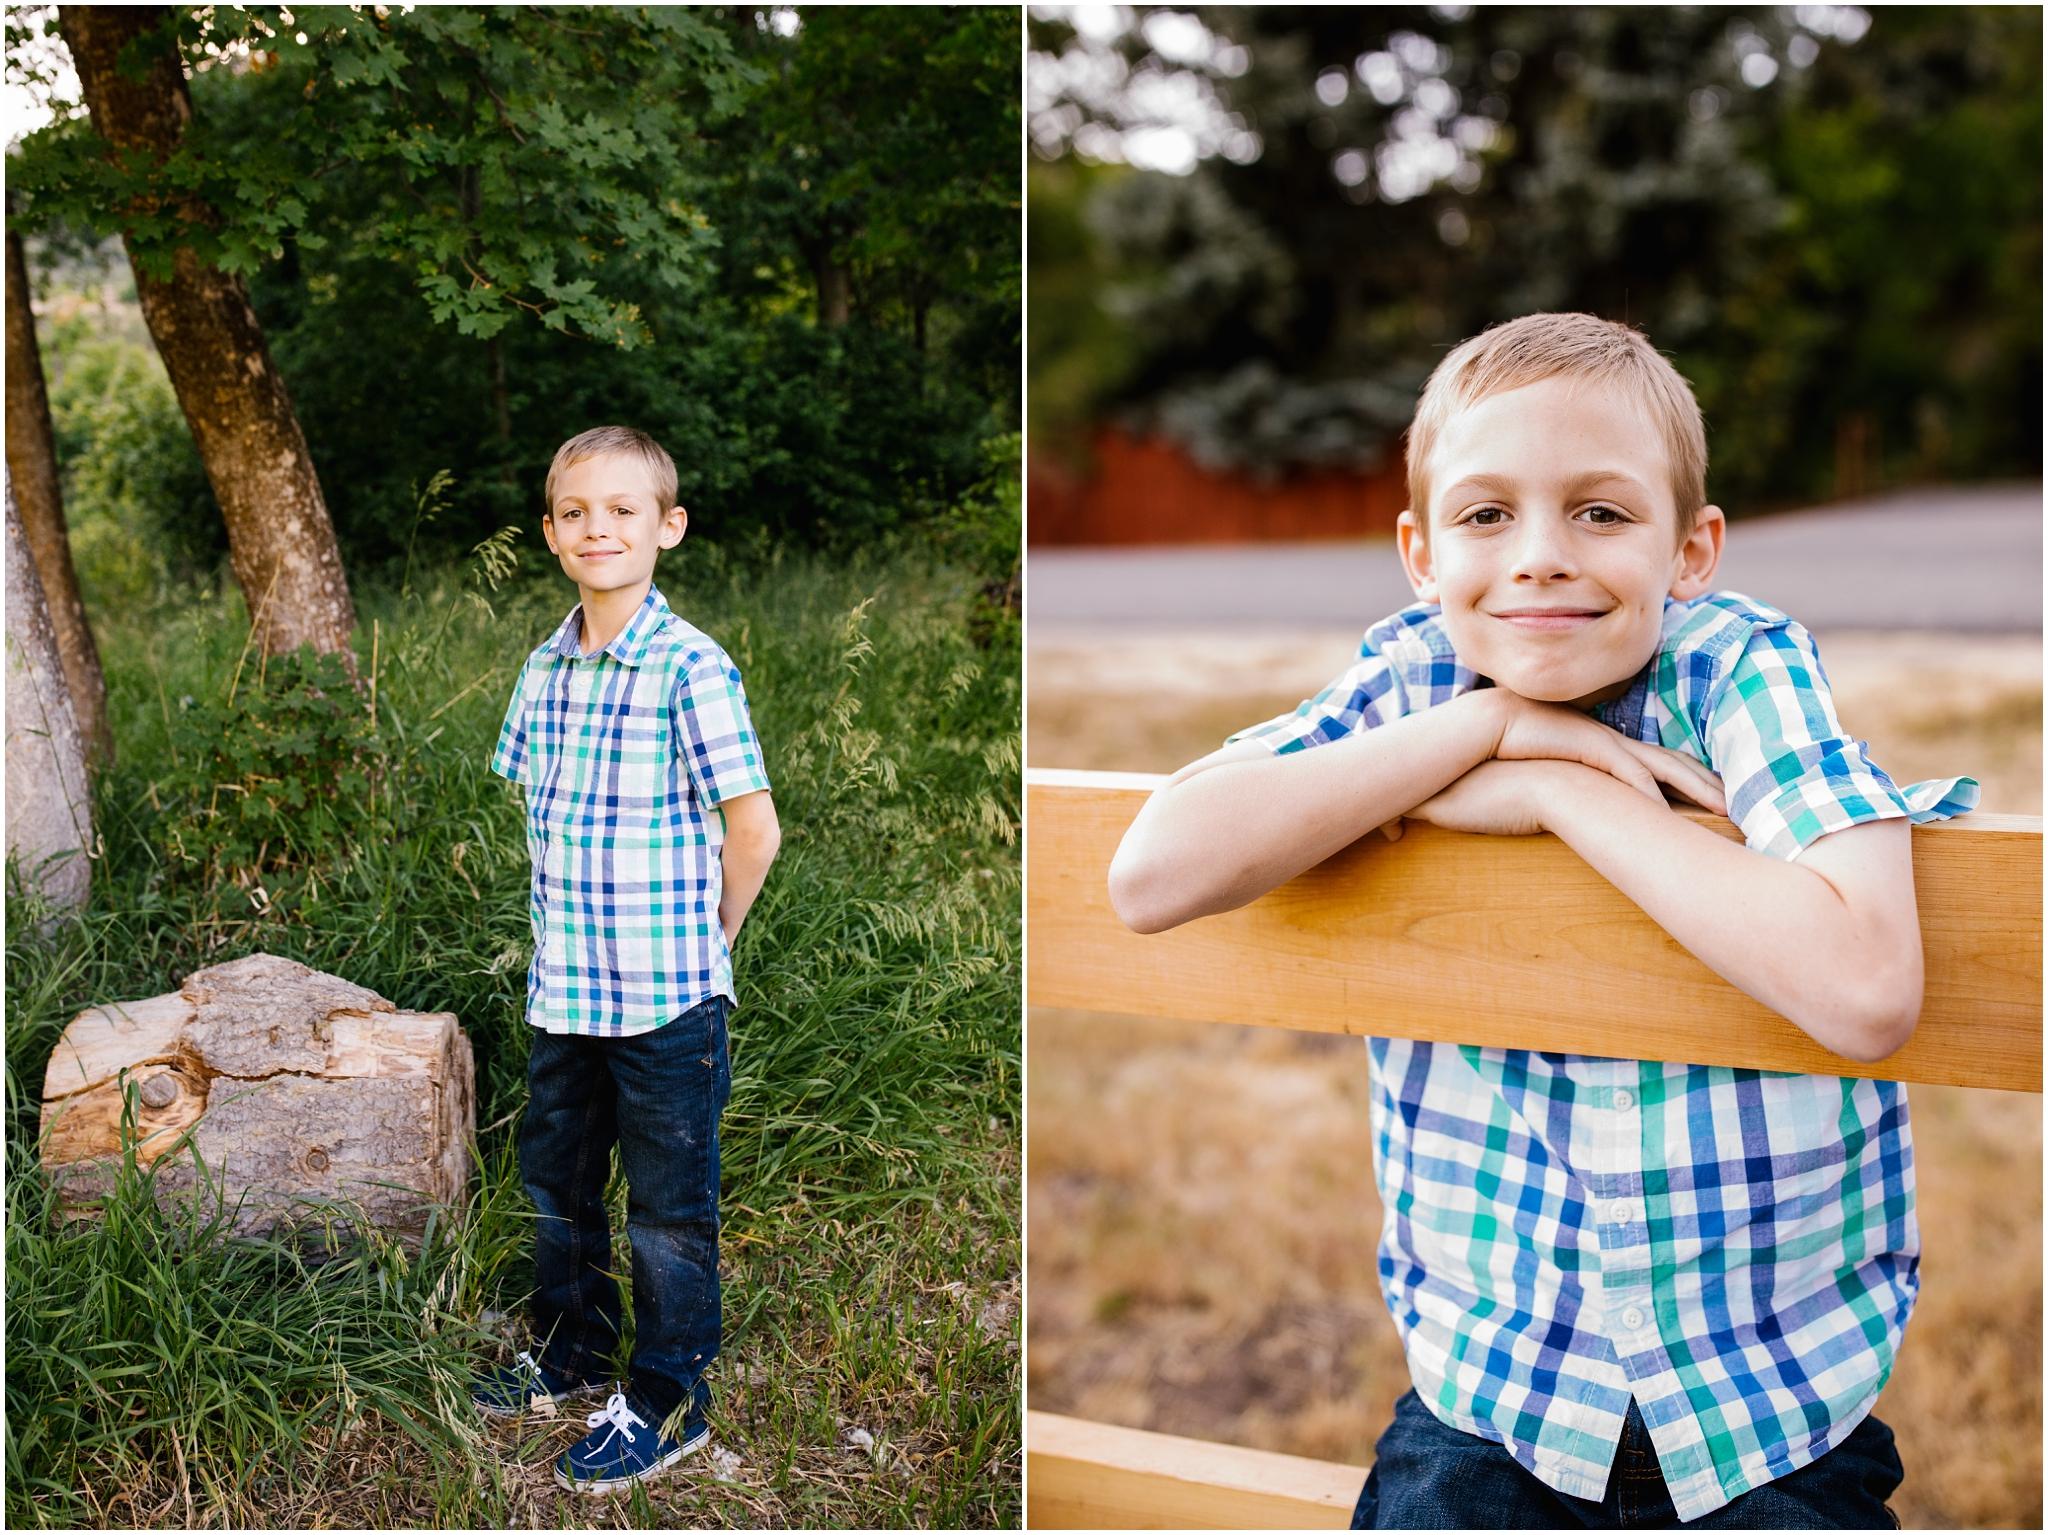 Lizzie-B-Imagery-Utah-Family-Photographer-Utah-County-Photographer-Hobble-Creek-Canyon_0012.jpg